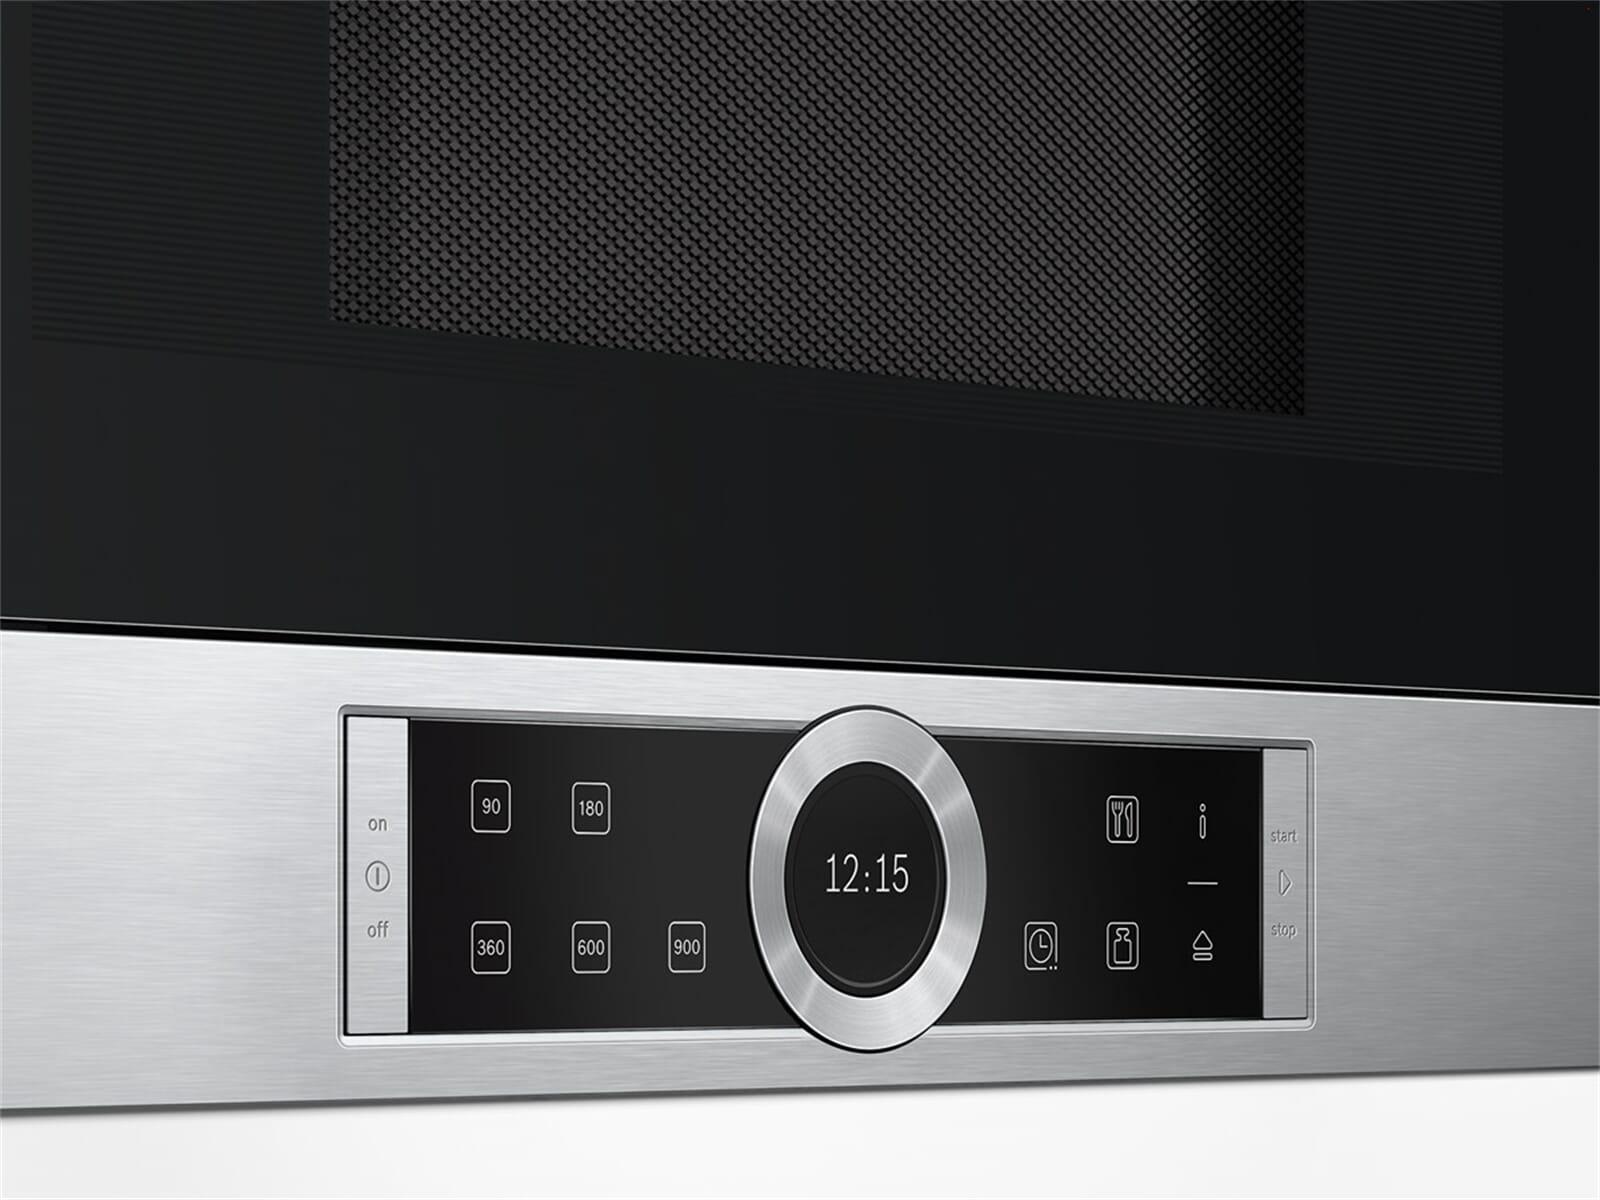 bosch bfl634gs1 einbau mikrowelle edelstahl microwelle. Black Bedroom Furniture Sets. Home Design Ideas